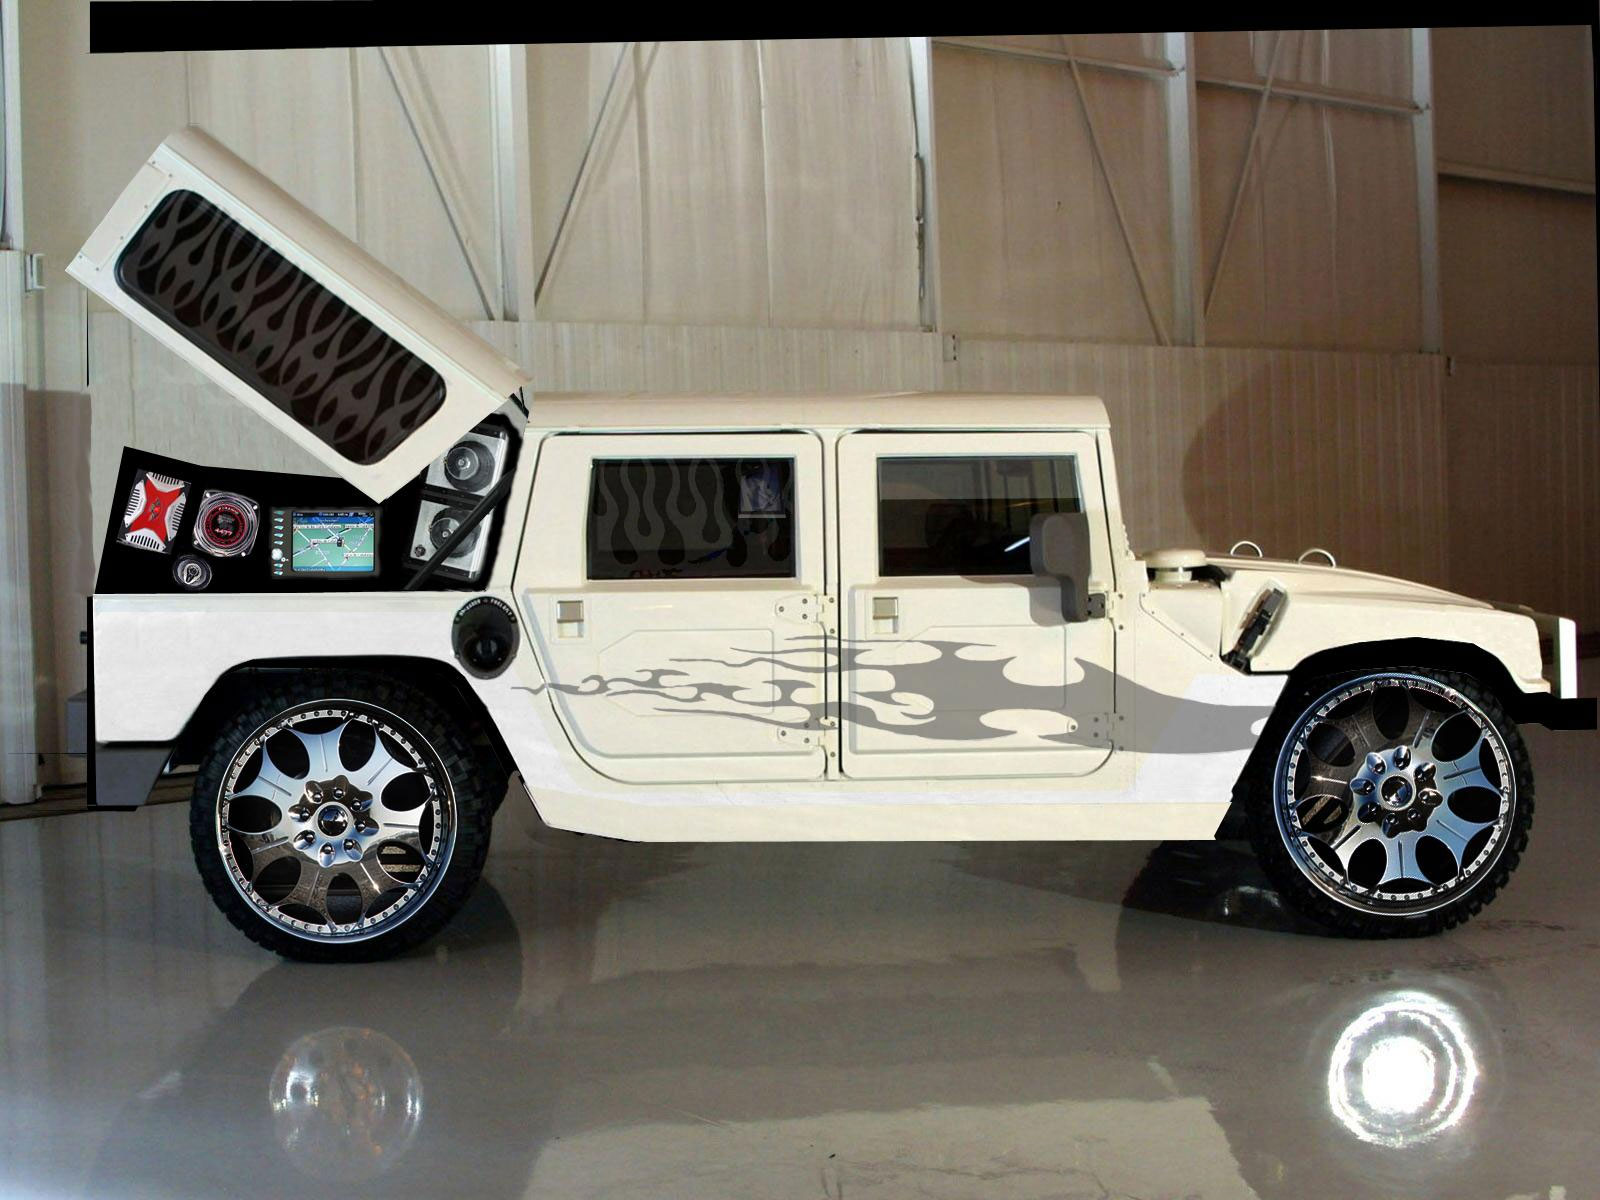 http://2.bp.blogspot.com/_YKOchf32w-Q/TQRfmILKf0I/AAAAAAAAEDk/vQIC3a4omuA/s1600/custom-made-cars.jpg